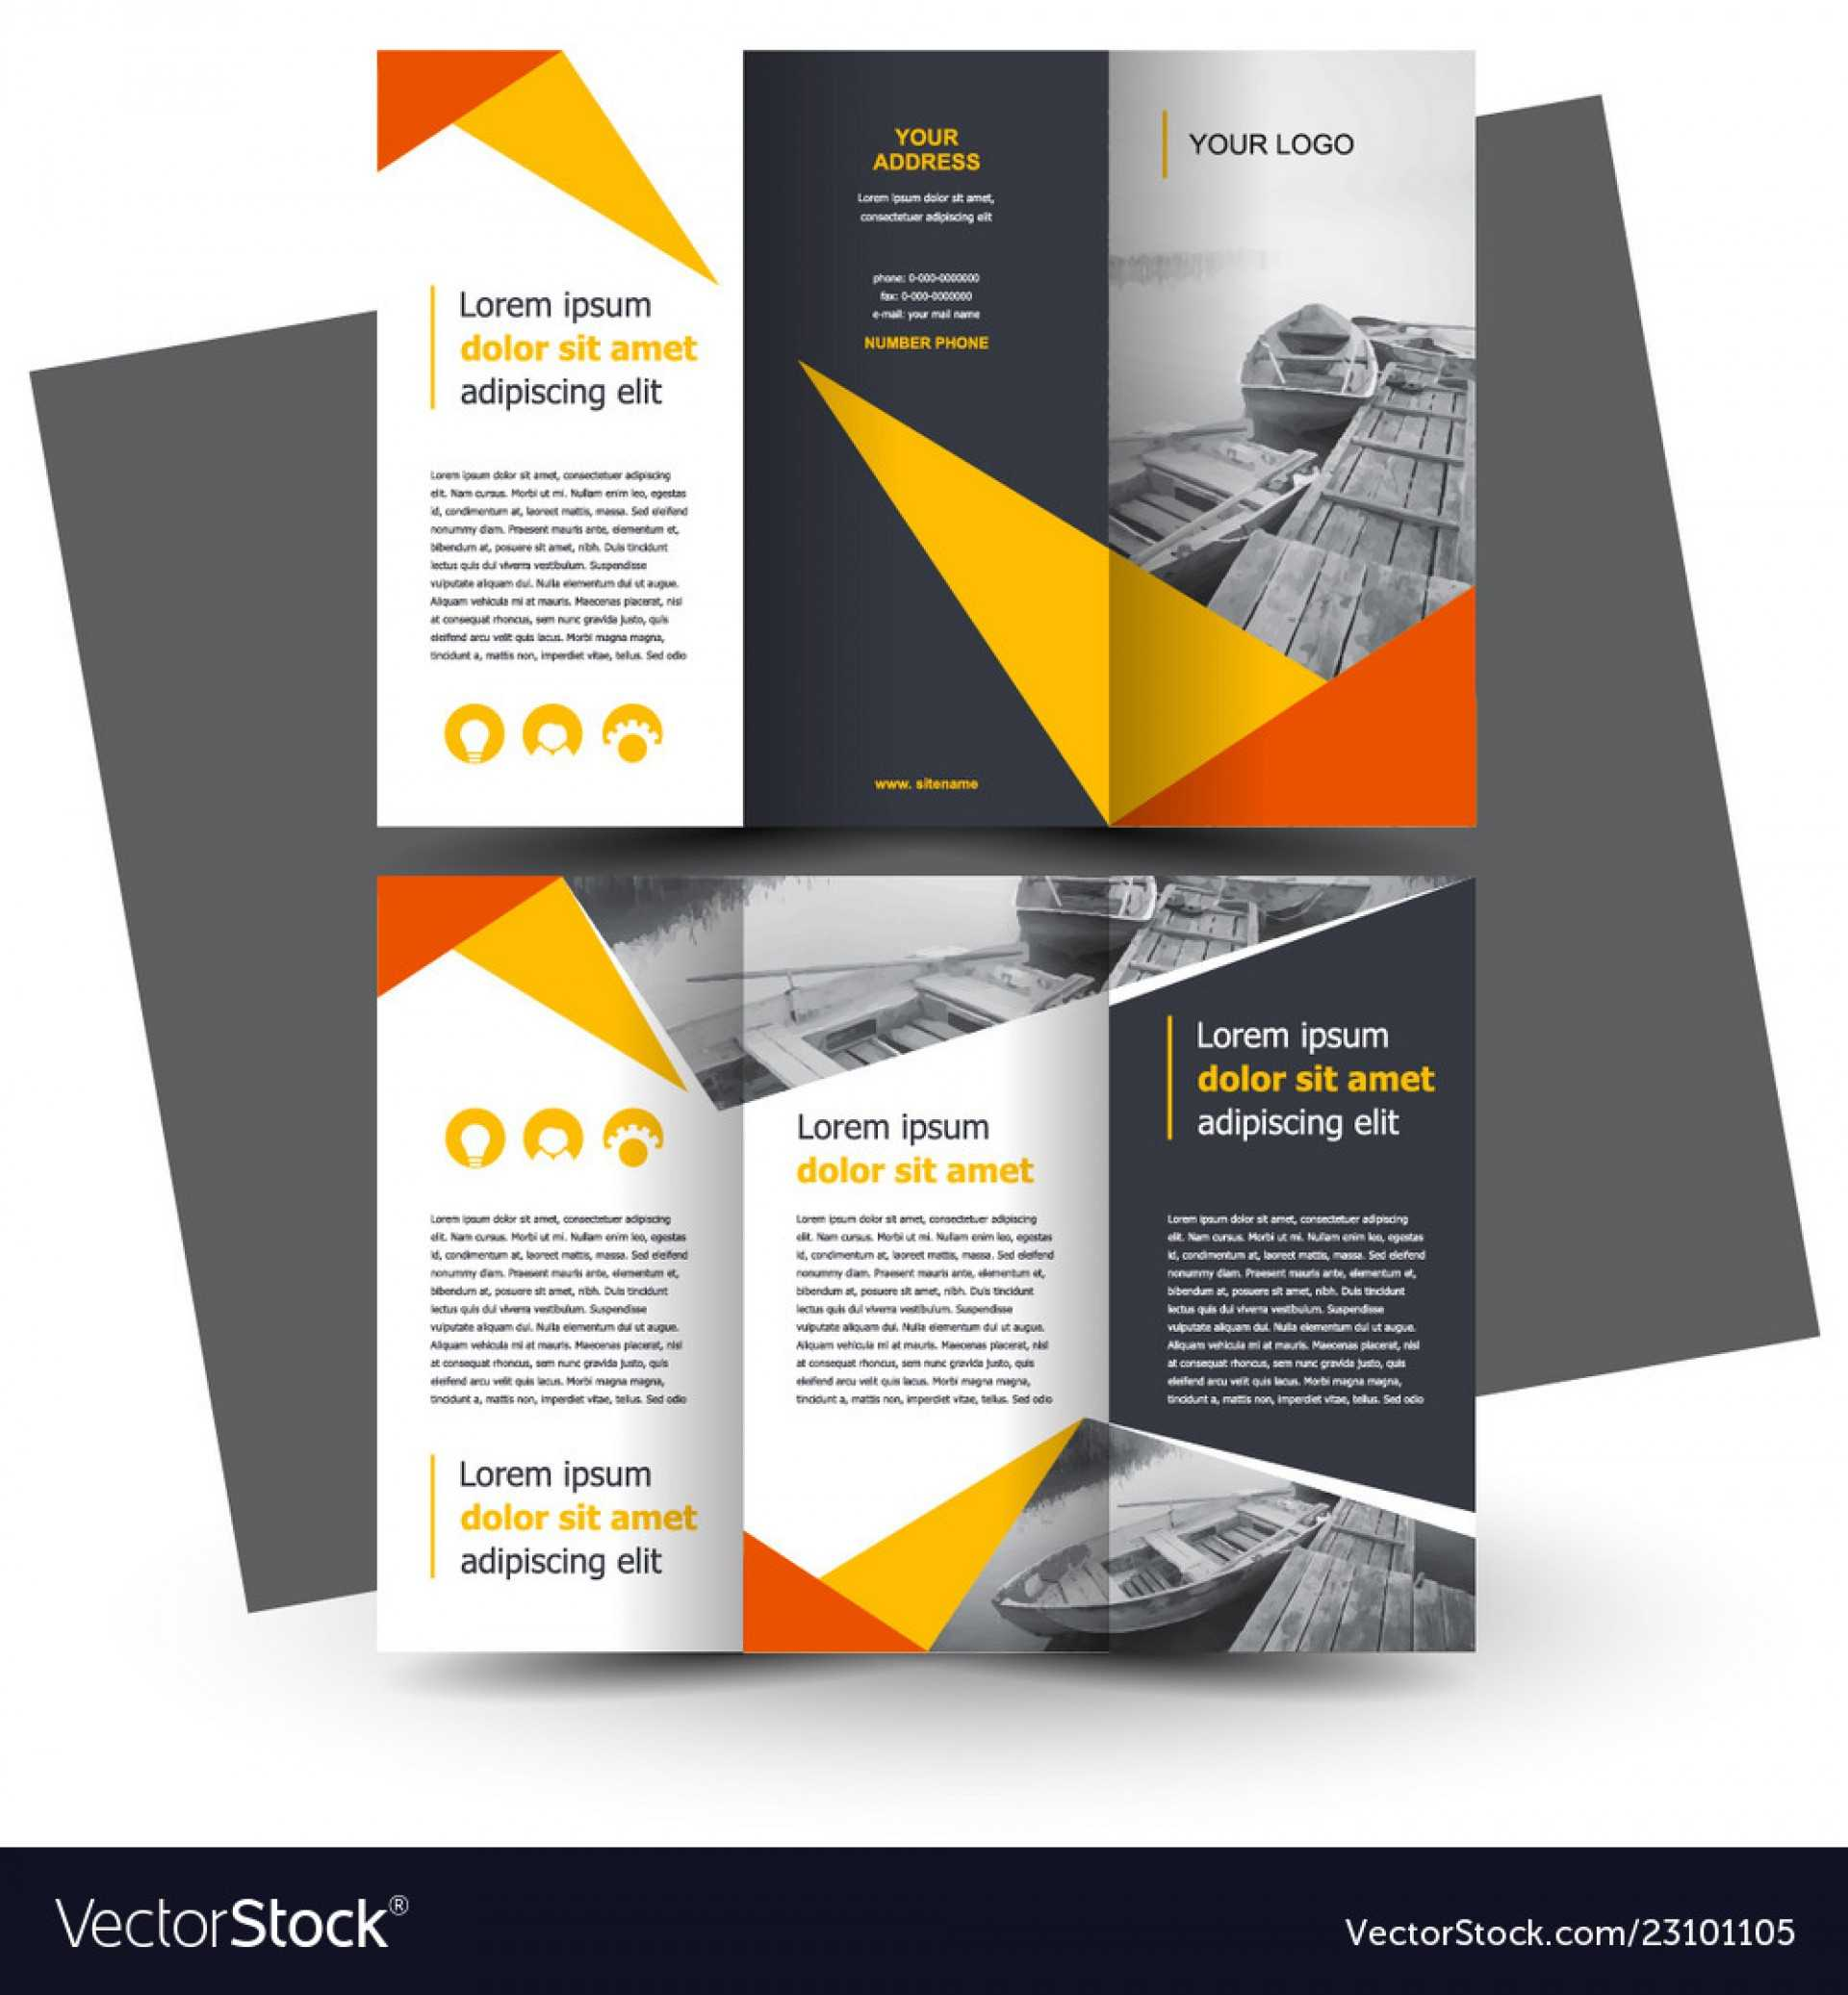 008 Microsoft Publisher Tri Fold Brochure Templates Free Inside Tri Fold Brochure Publisher Template